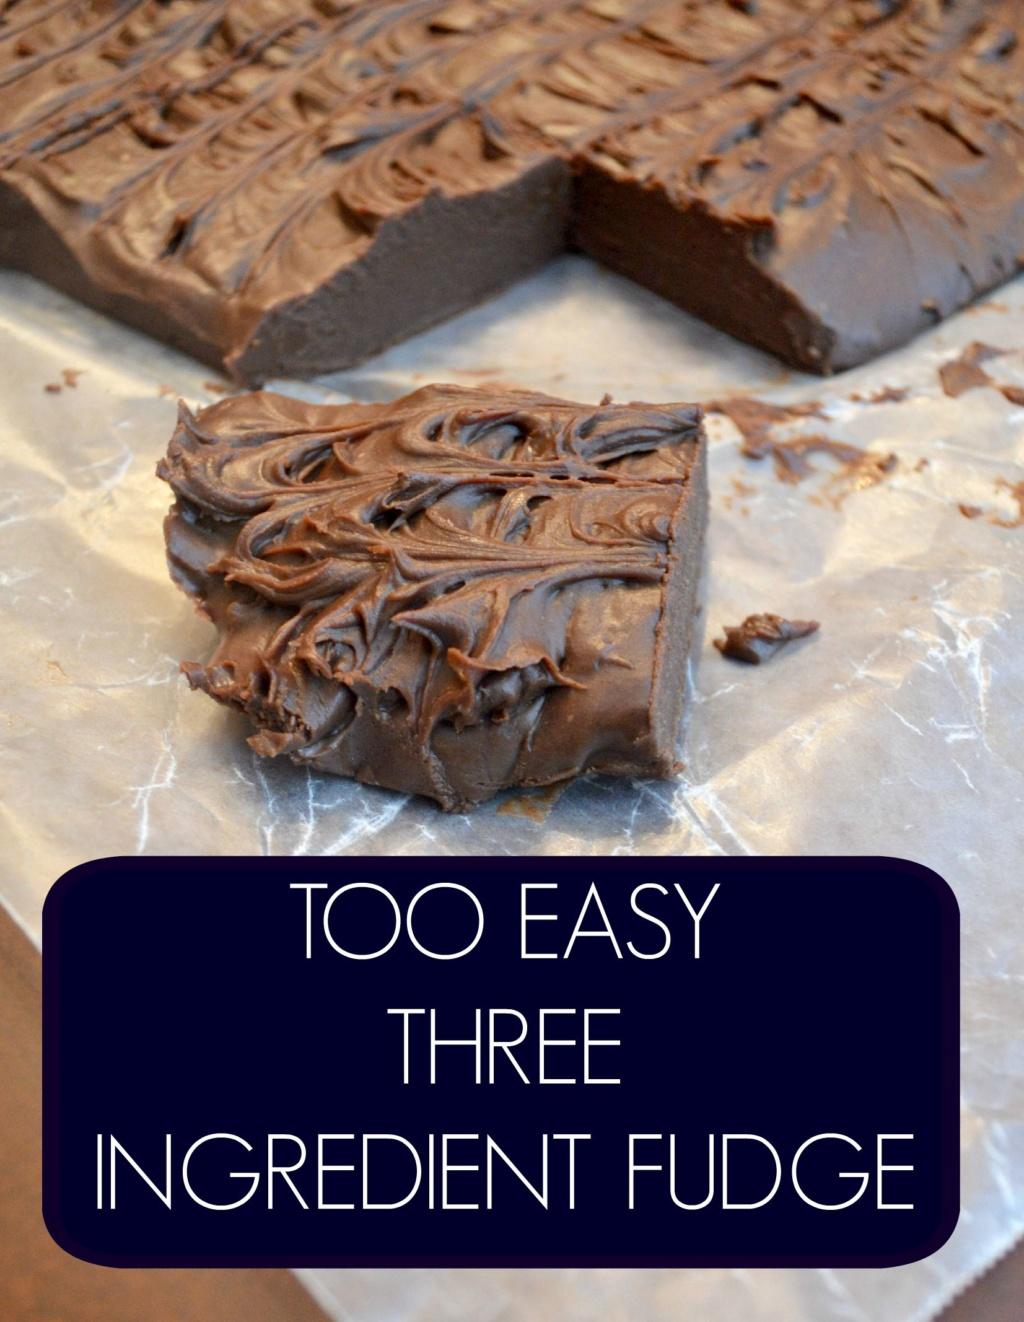 Too Easy Three Ingredient Fudge